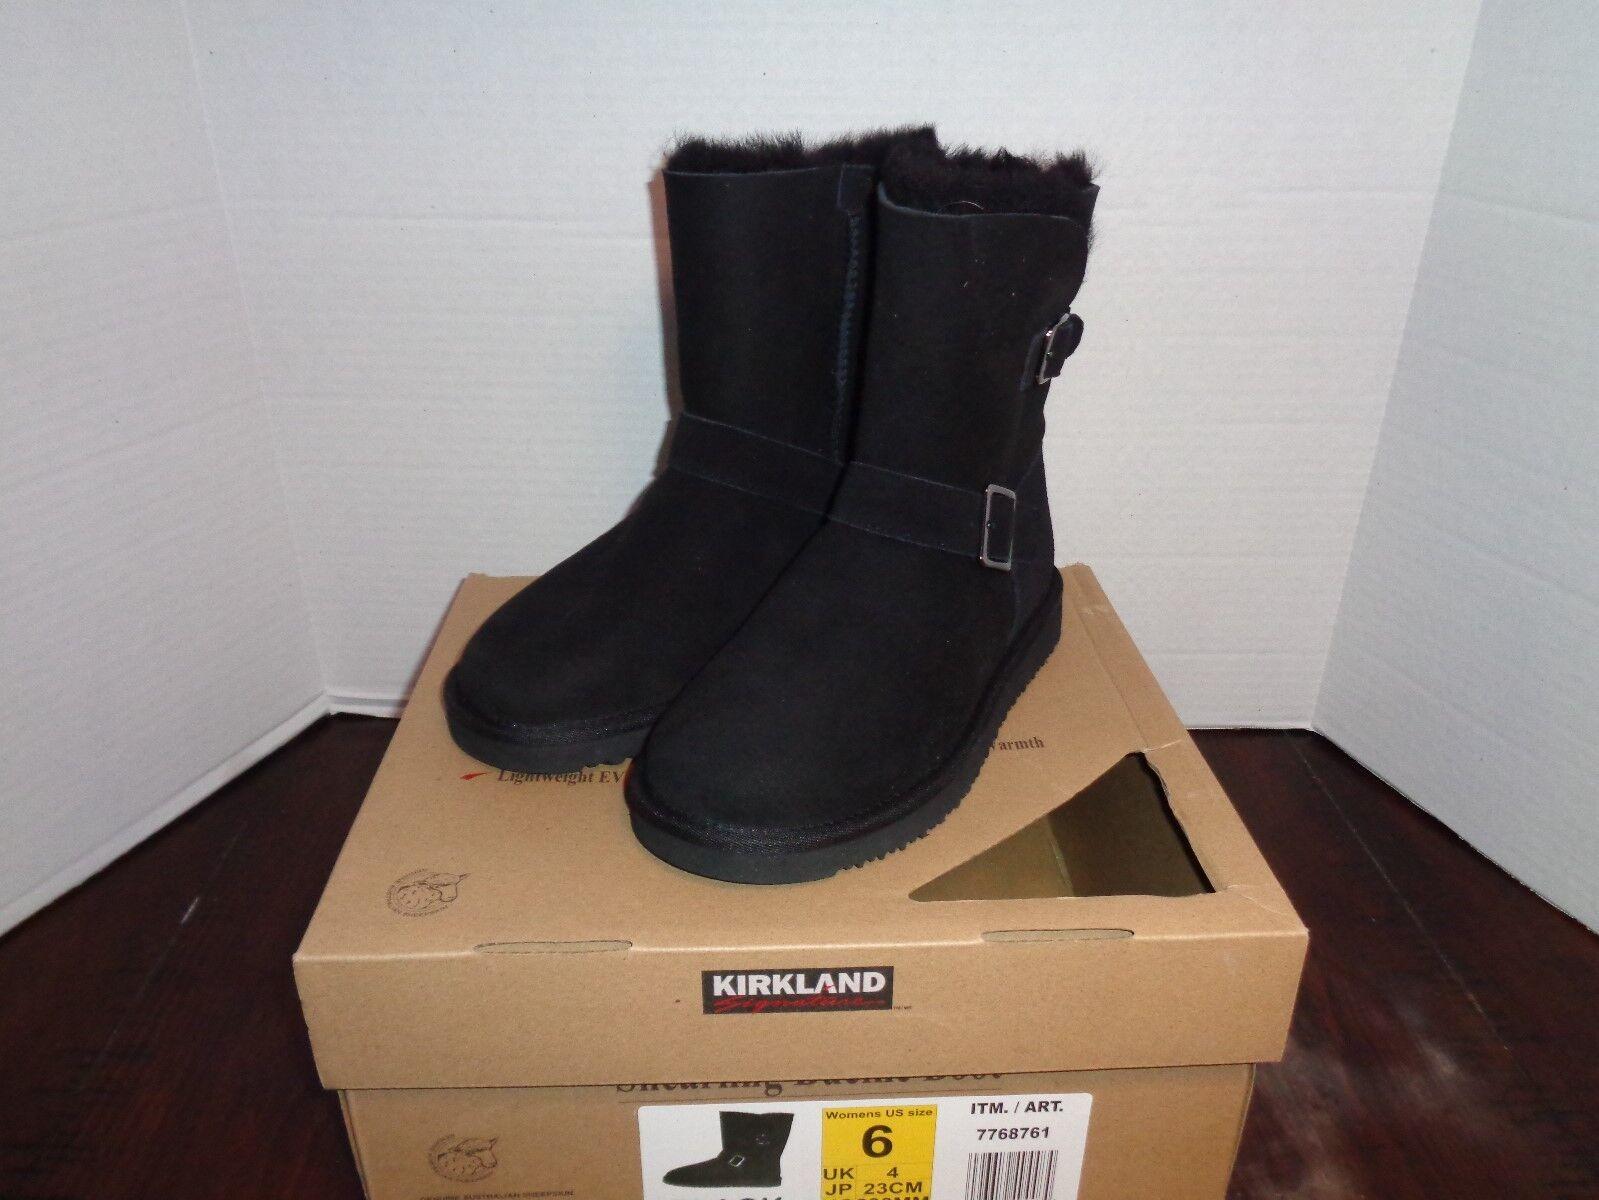 Kirkland Signature Women's Black Shearling Buckle Boots Size 6